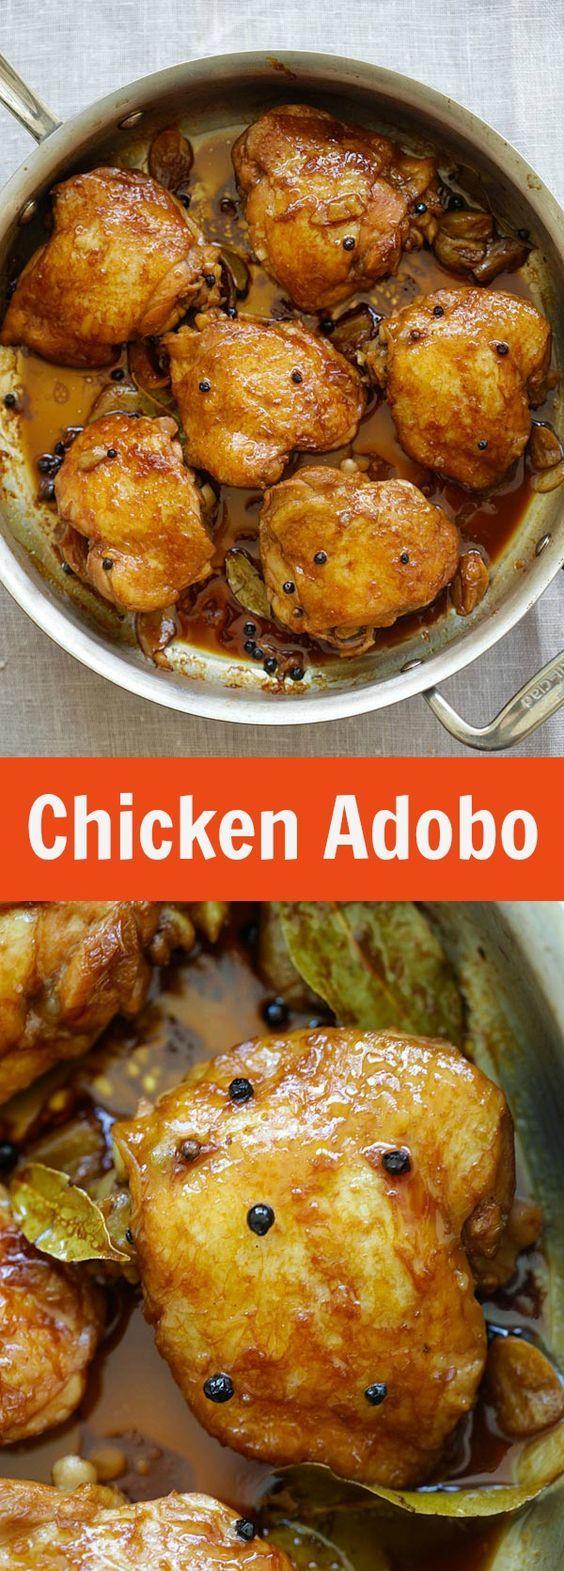 Chicken Adobo - crazy delicious Filipino Chicken Adobo recipe made in one pot. Chicken Abodo is a perfect dinner for the entire family | rasamalaysia.com